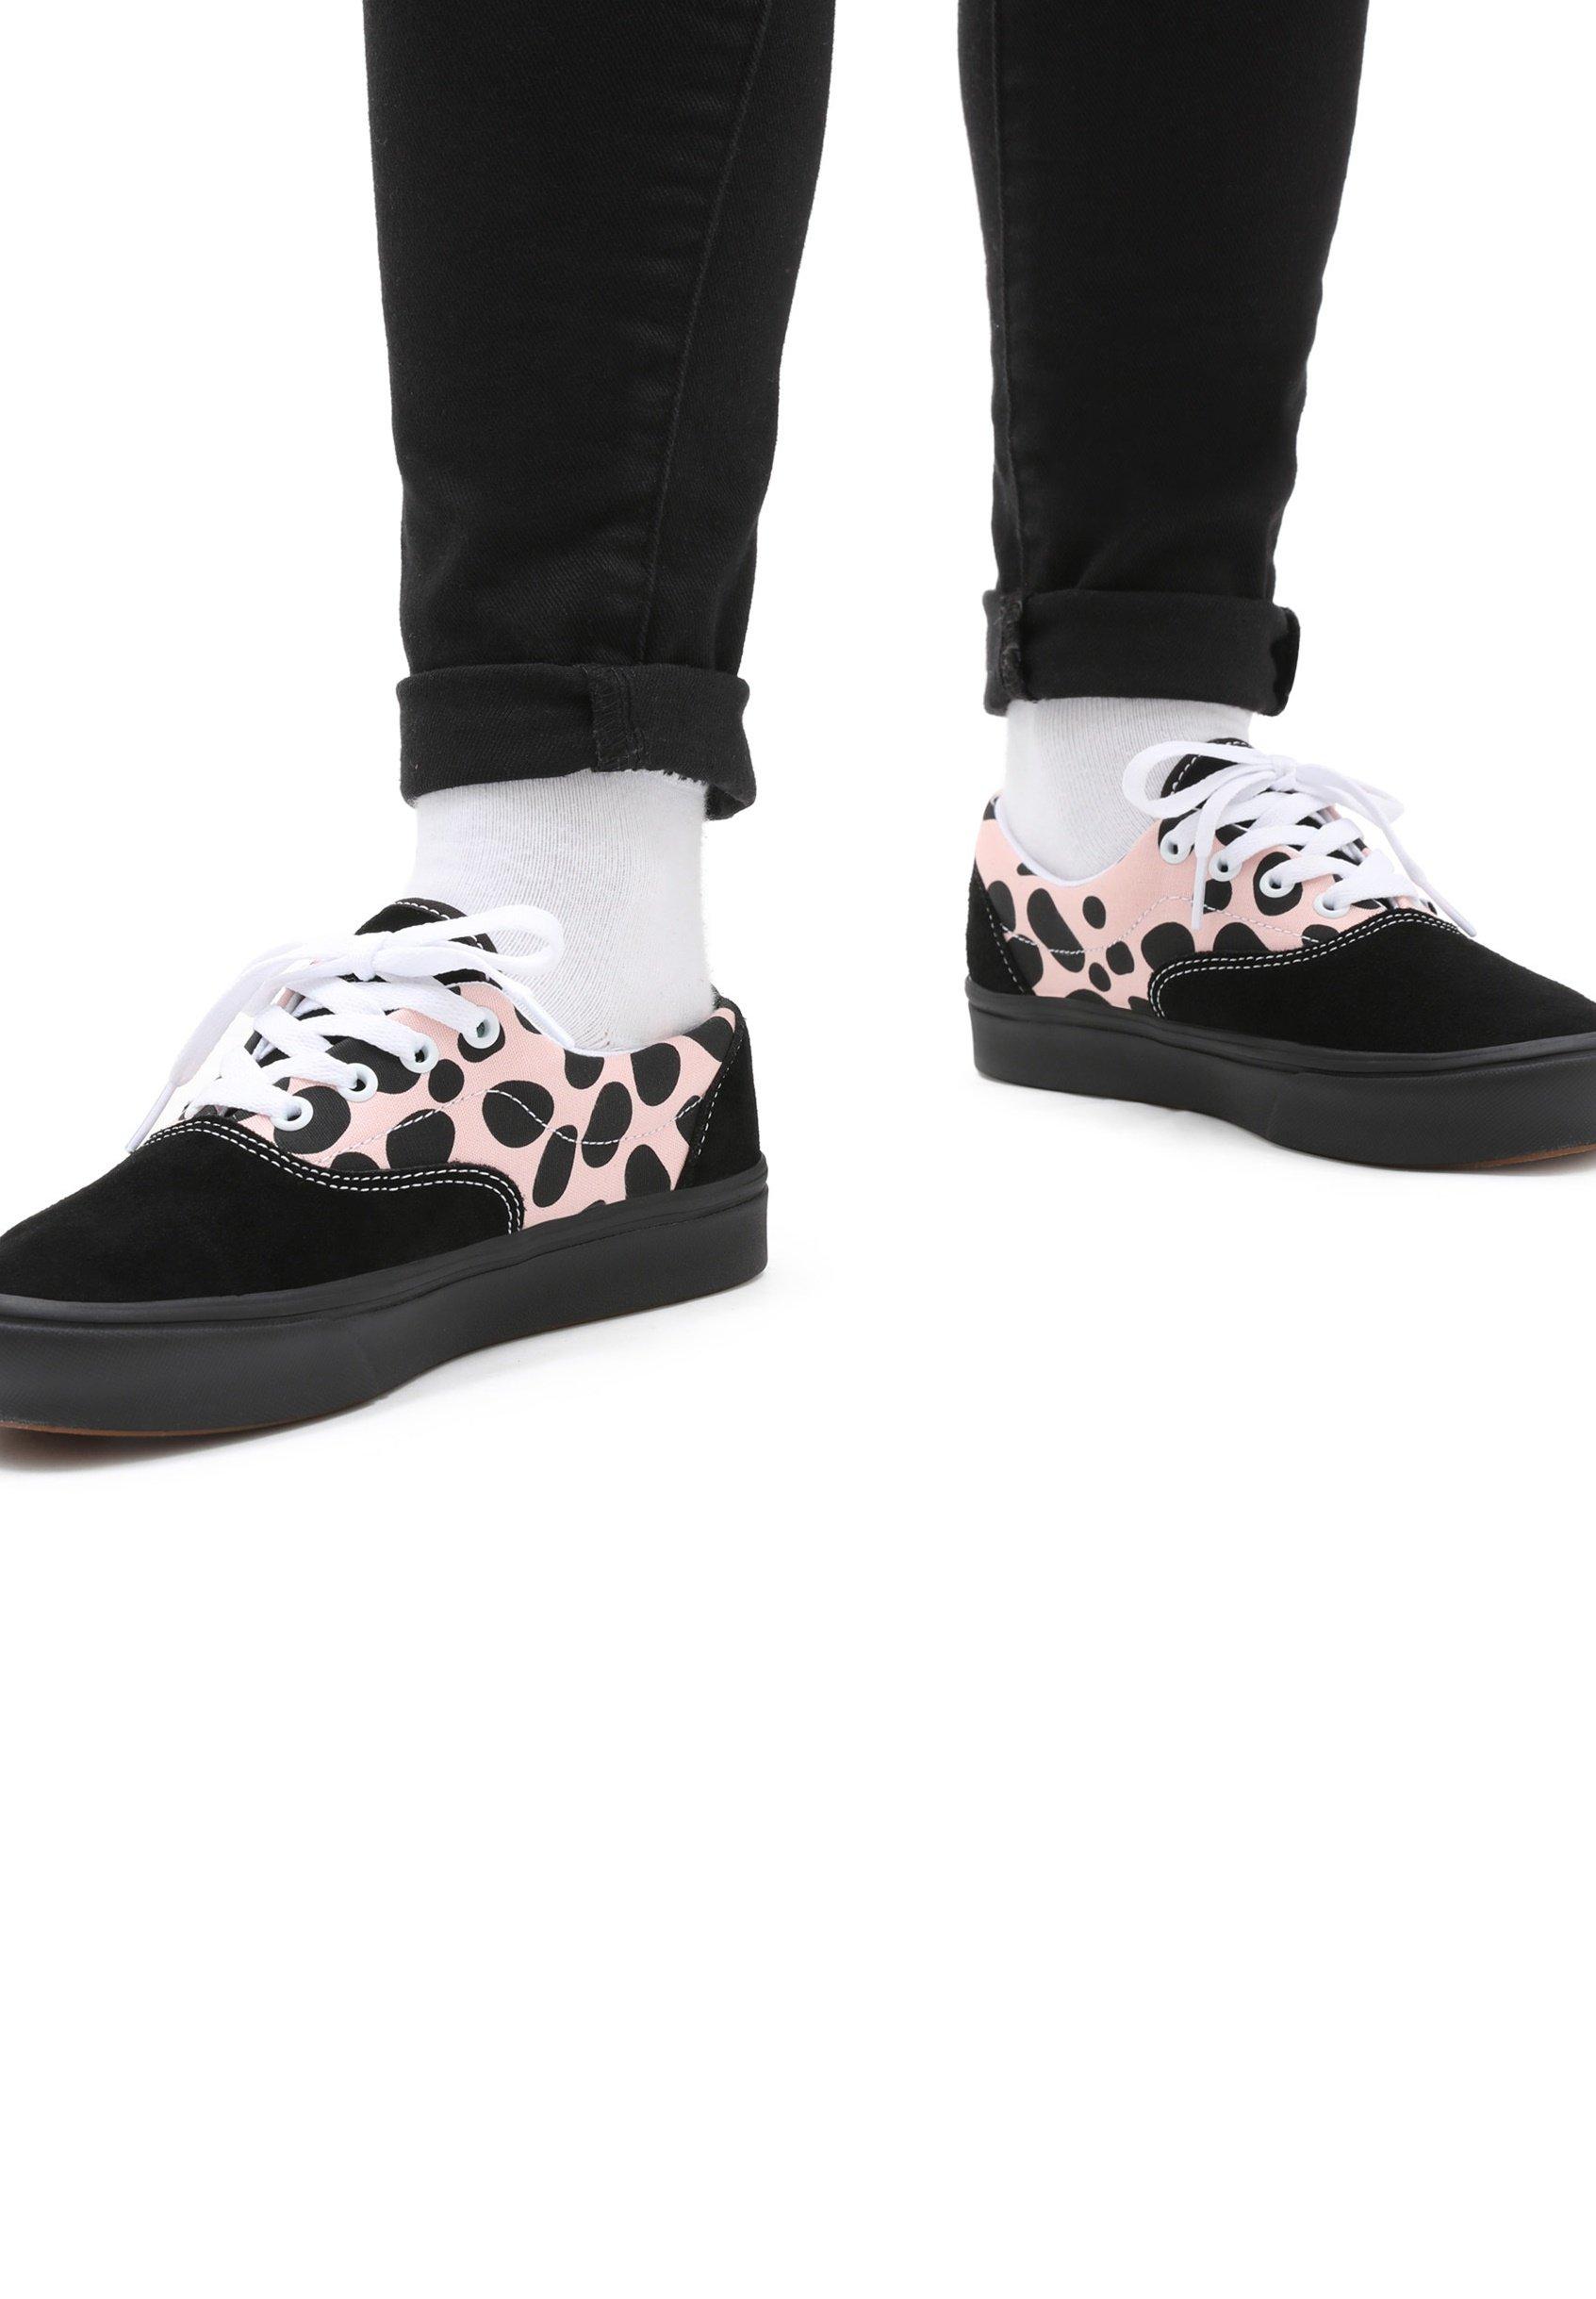 Hombre UA COMFYCUSH ERA - Zapatos con cordones